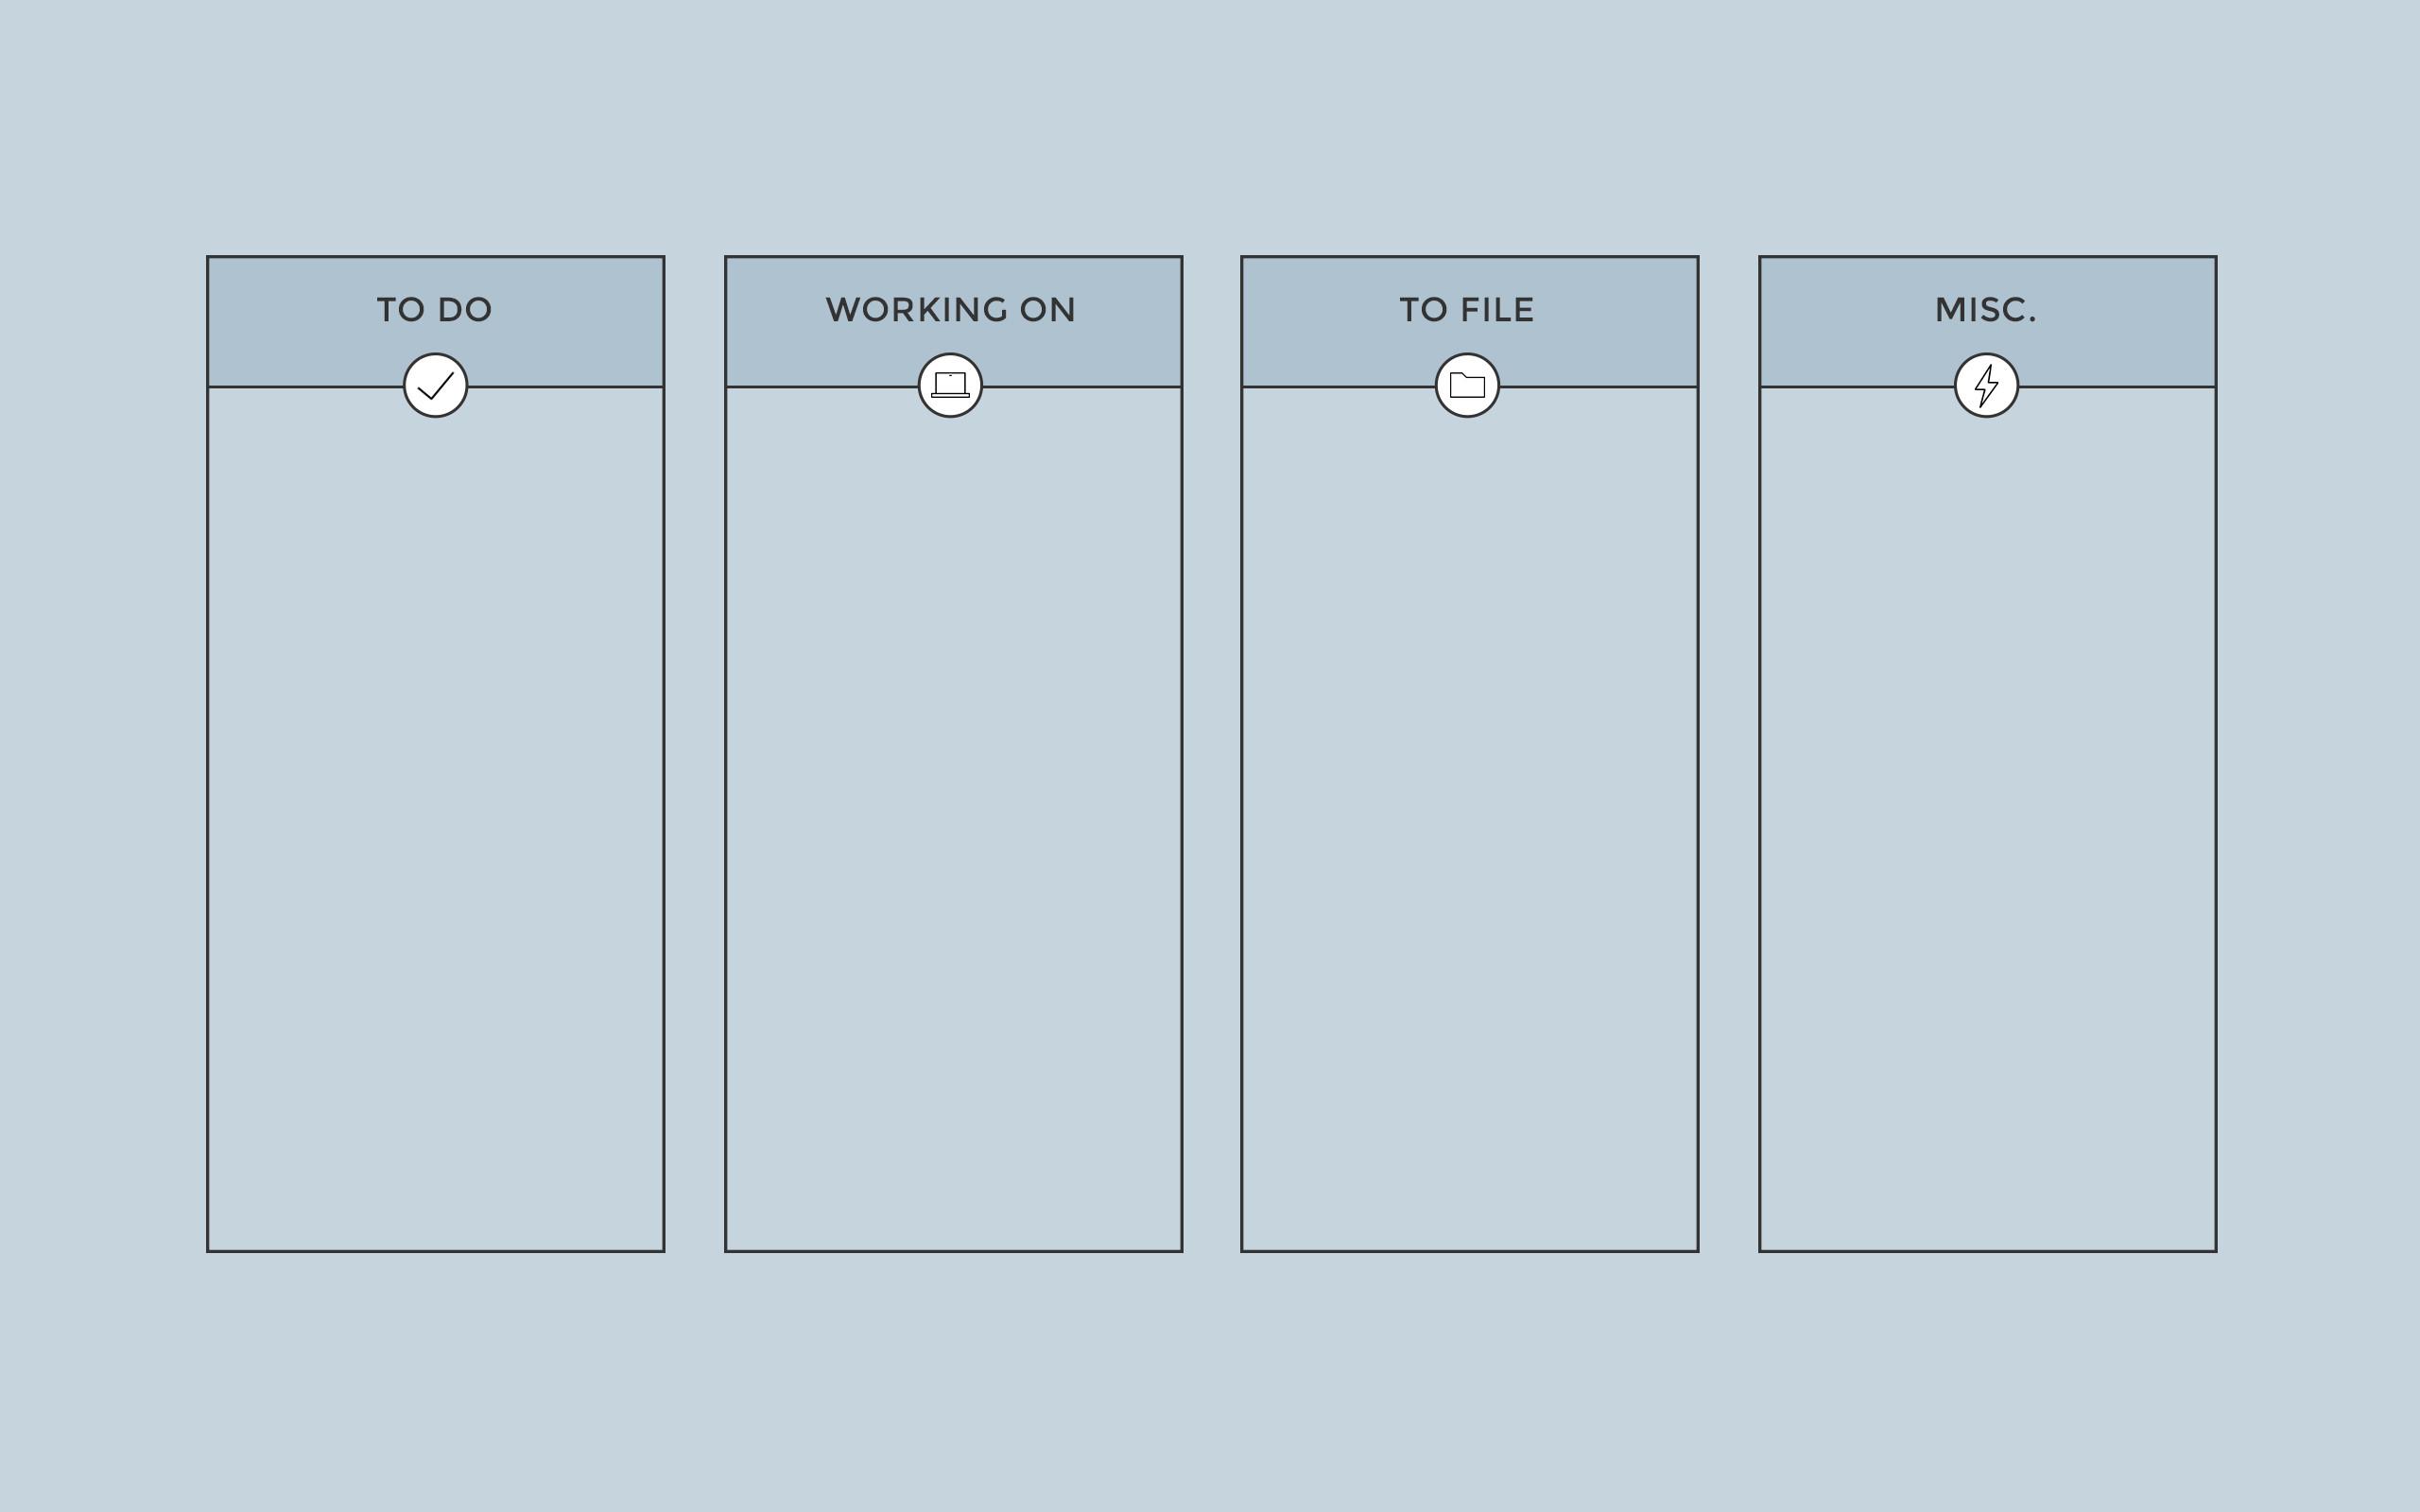 Calendar Planner In Windows : Productivity desktop wallpaper images